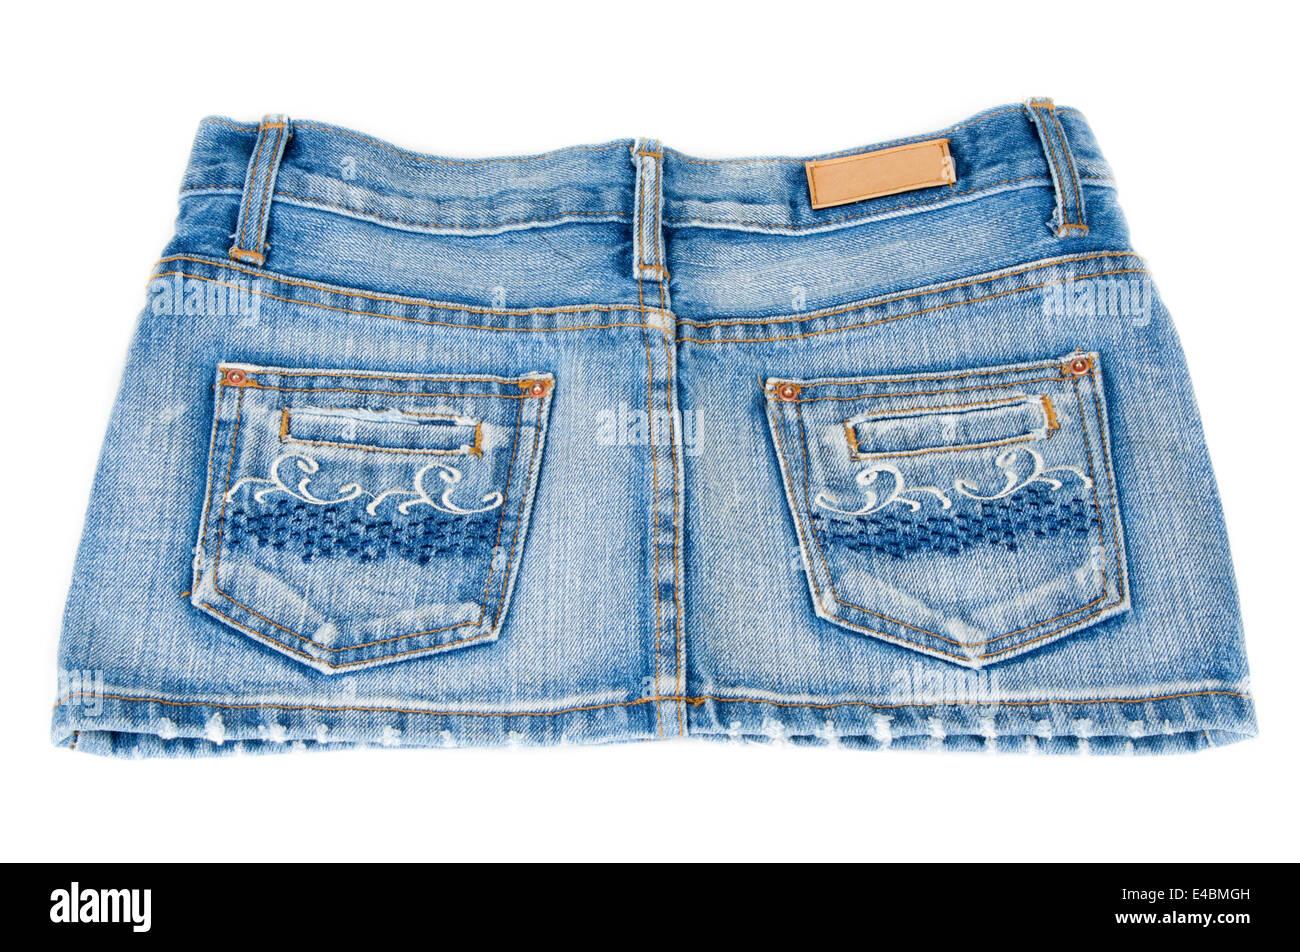 Jeans mini skirt - Stock Image